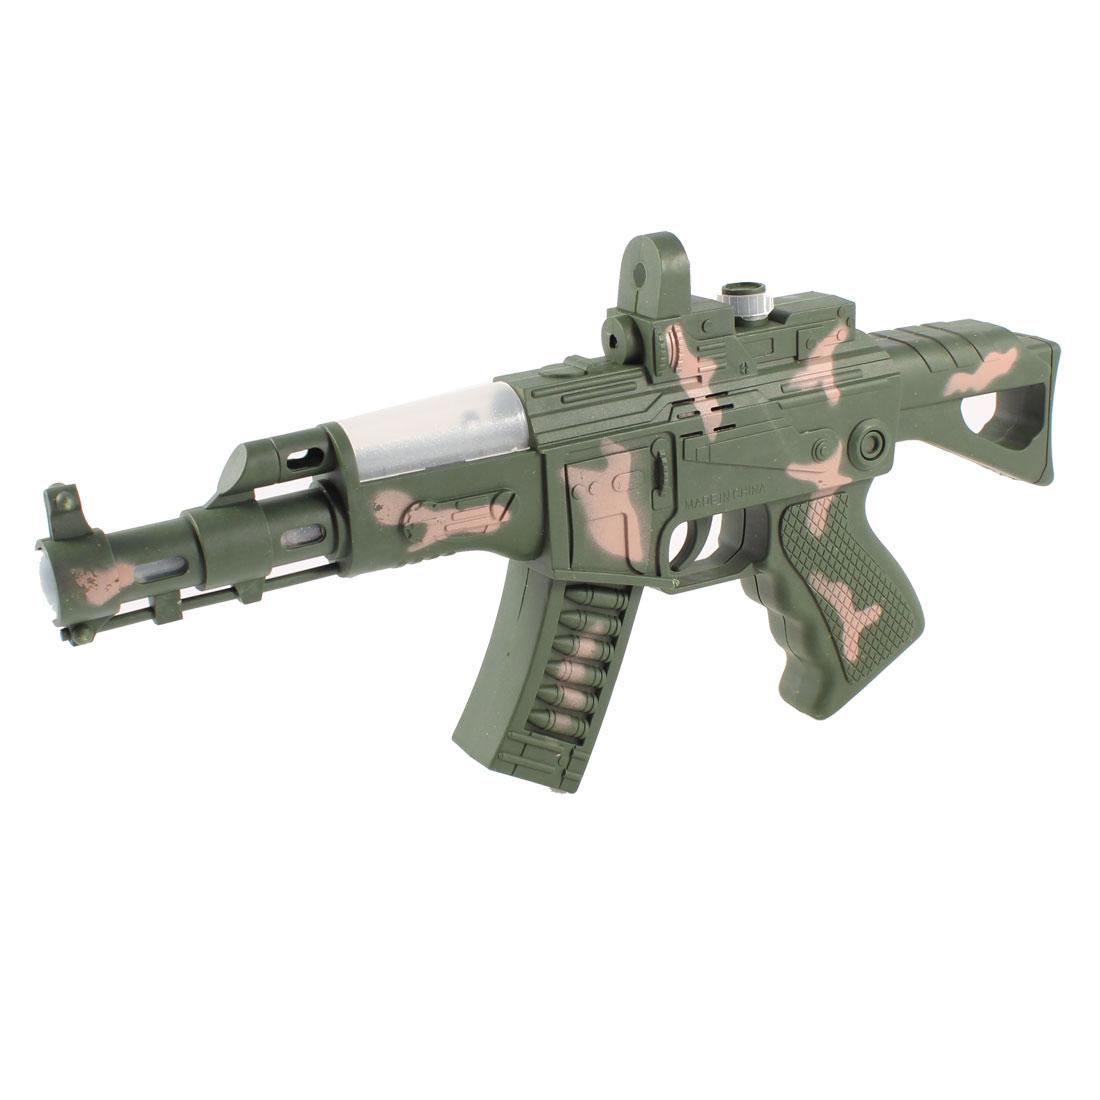 Dark Gray Plastic Camouflage Manual Machine Gun Model Toys for Children